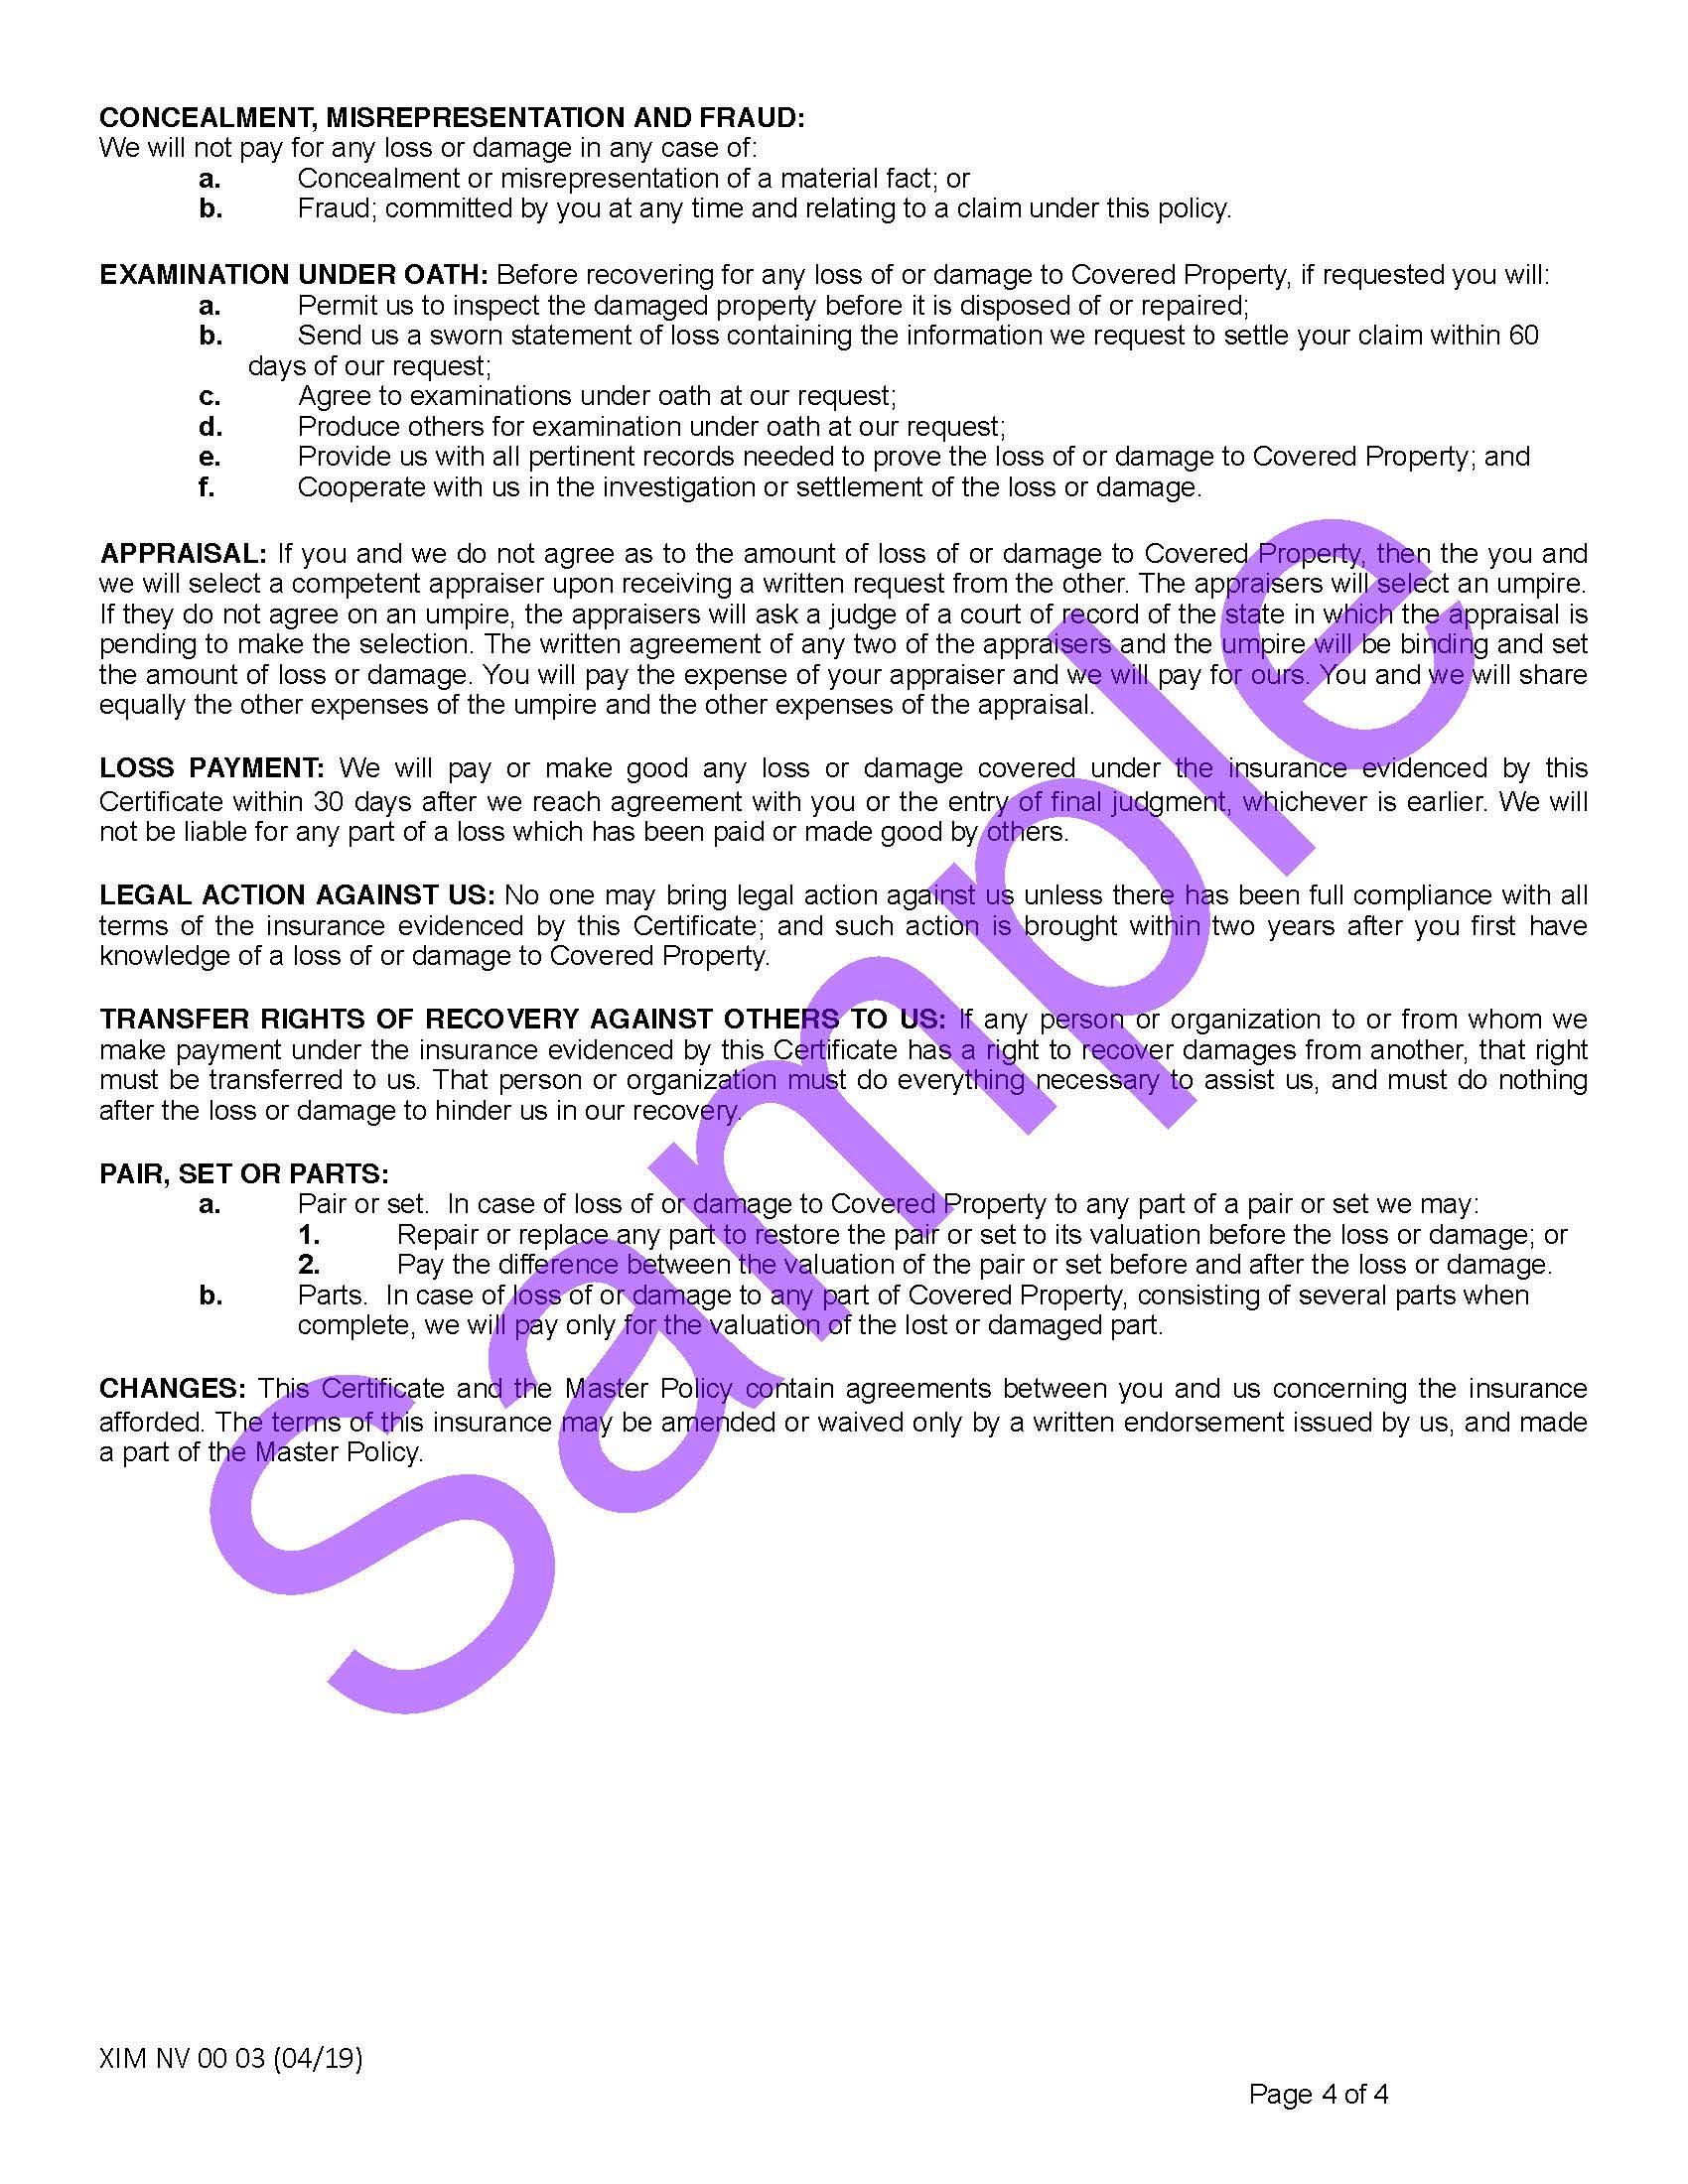 XIM NV 00 03 04 19 Nevada Certificate of InsuranceSample_Page_4.jpg